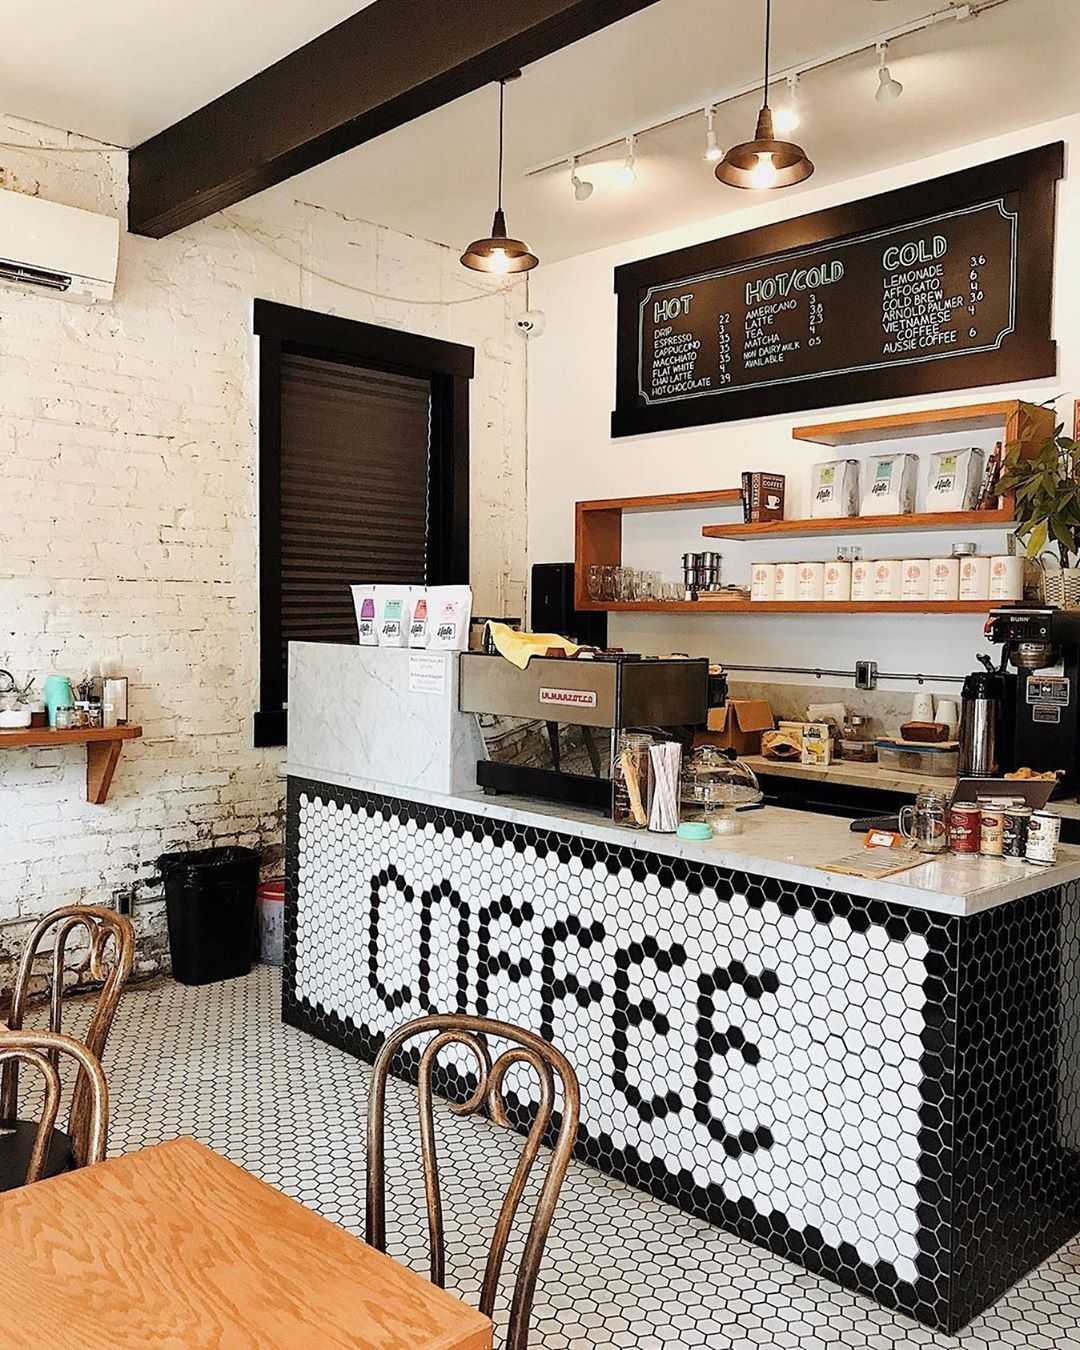 Daily Grind Toronto In 2020 Cozy Cafe Interior Cafe Interior Design Cafe Bar Design